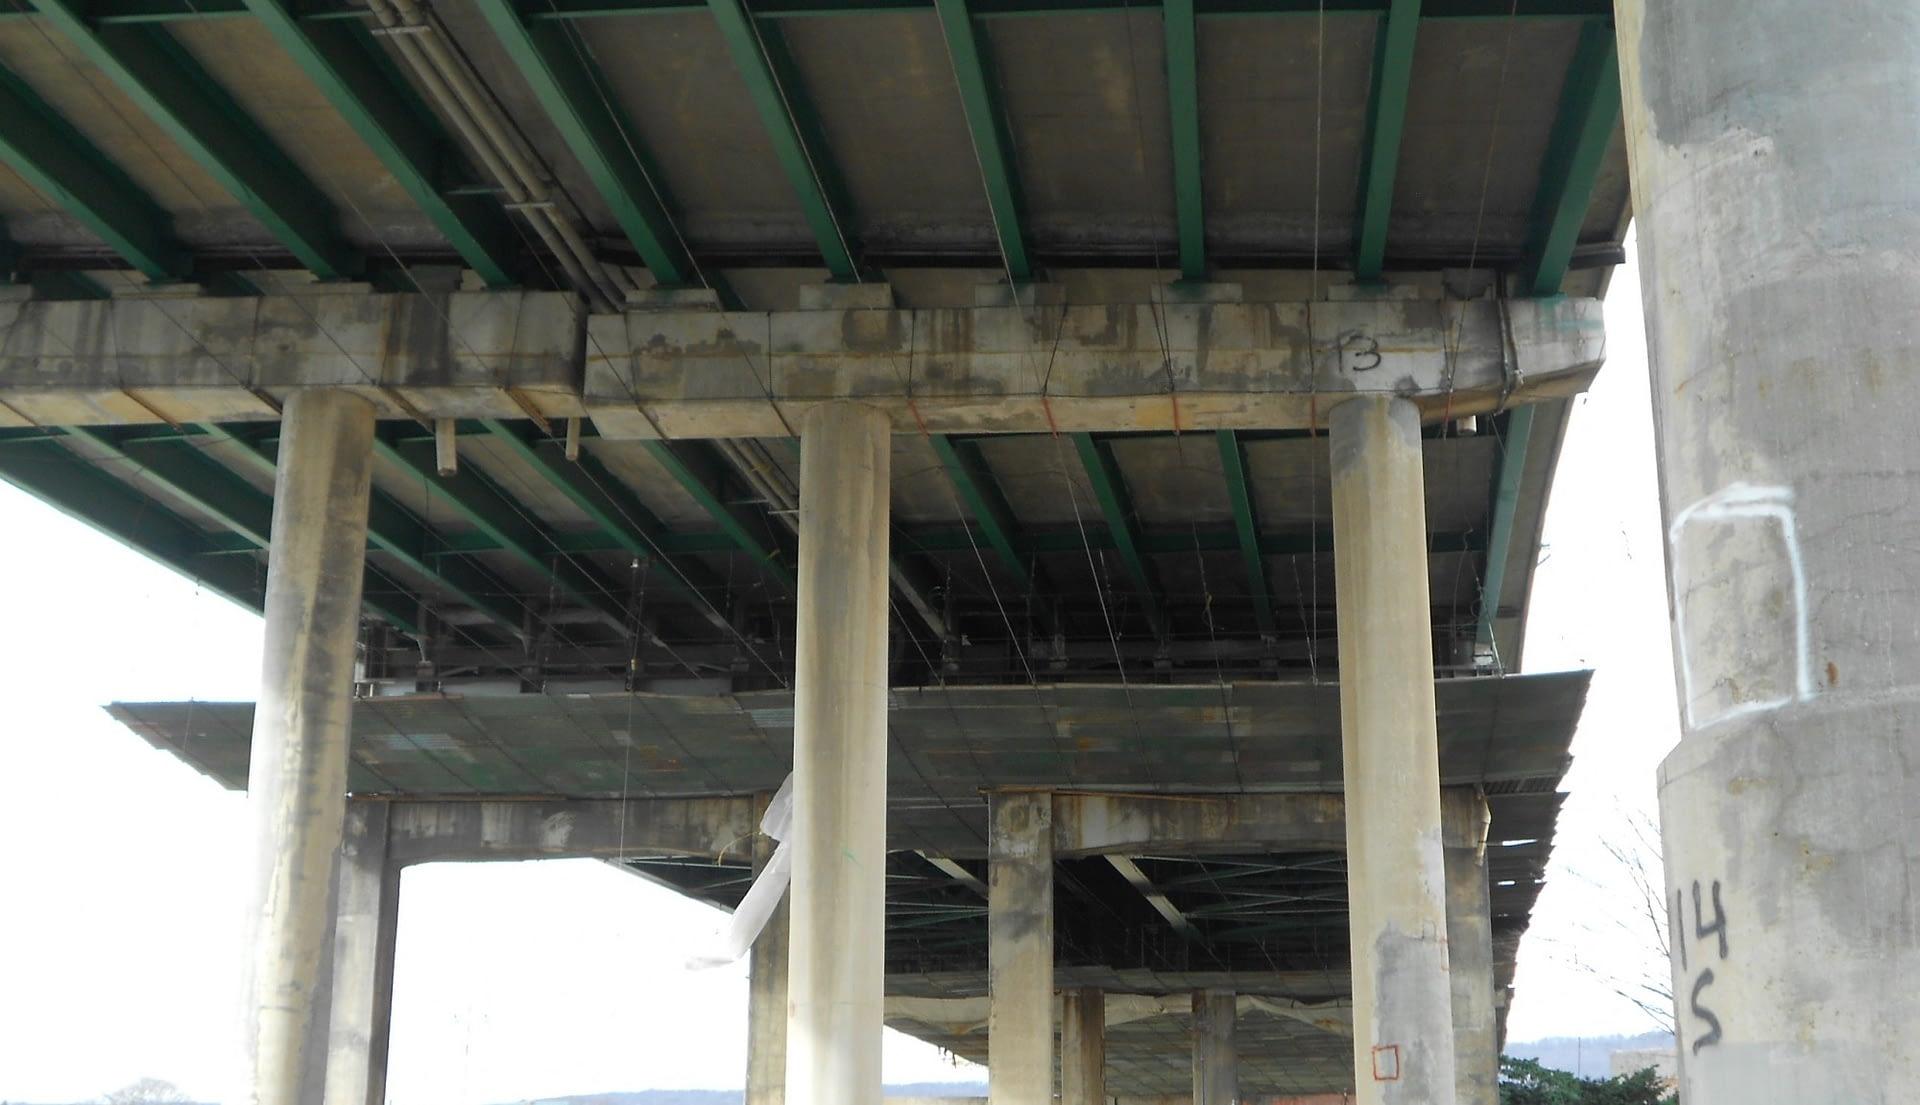 Bridge Underside Wide Sho